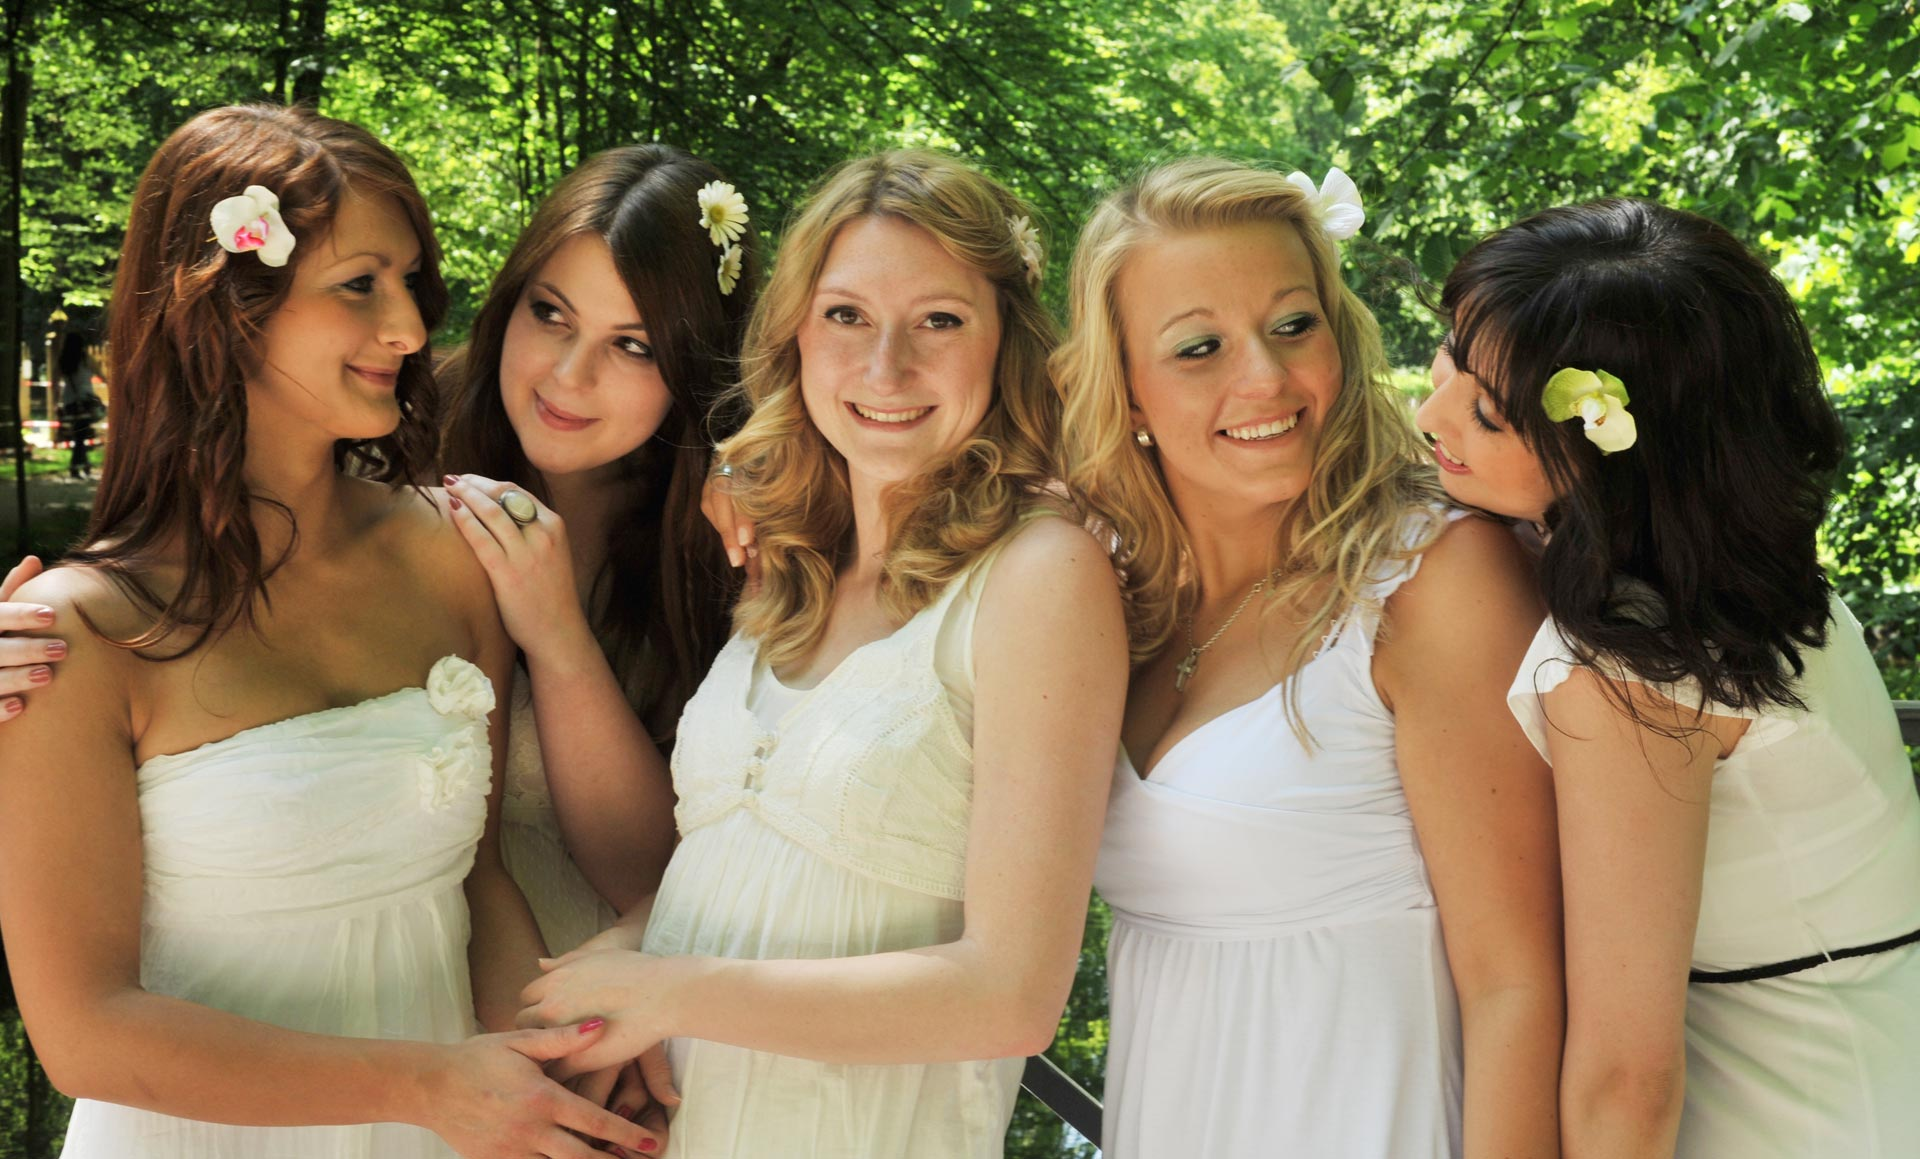 Junggesellenabschied JGA Fotoshooting Bachelors Outdoor